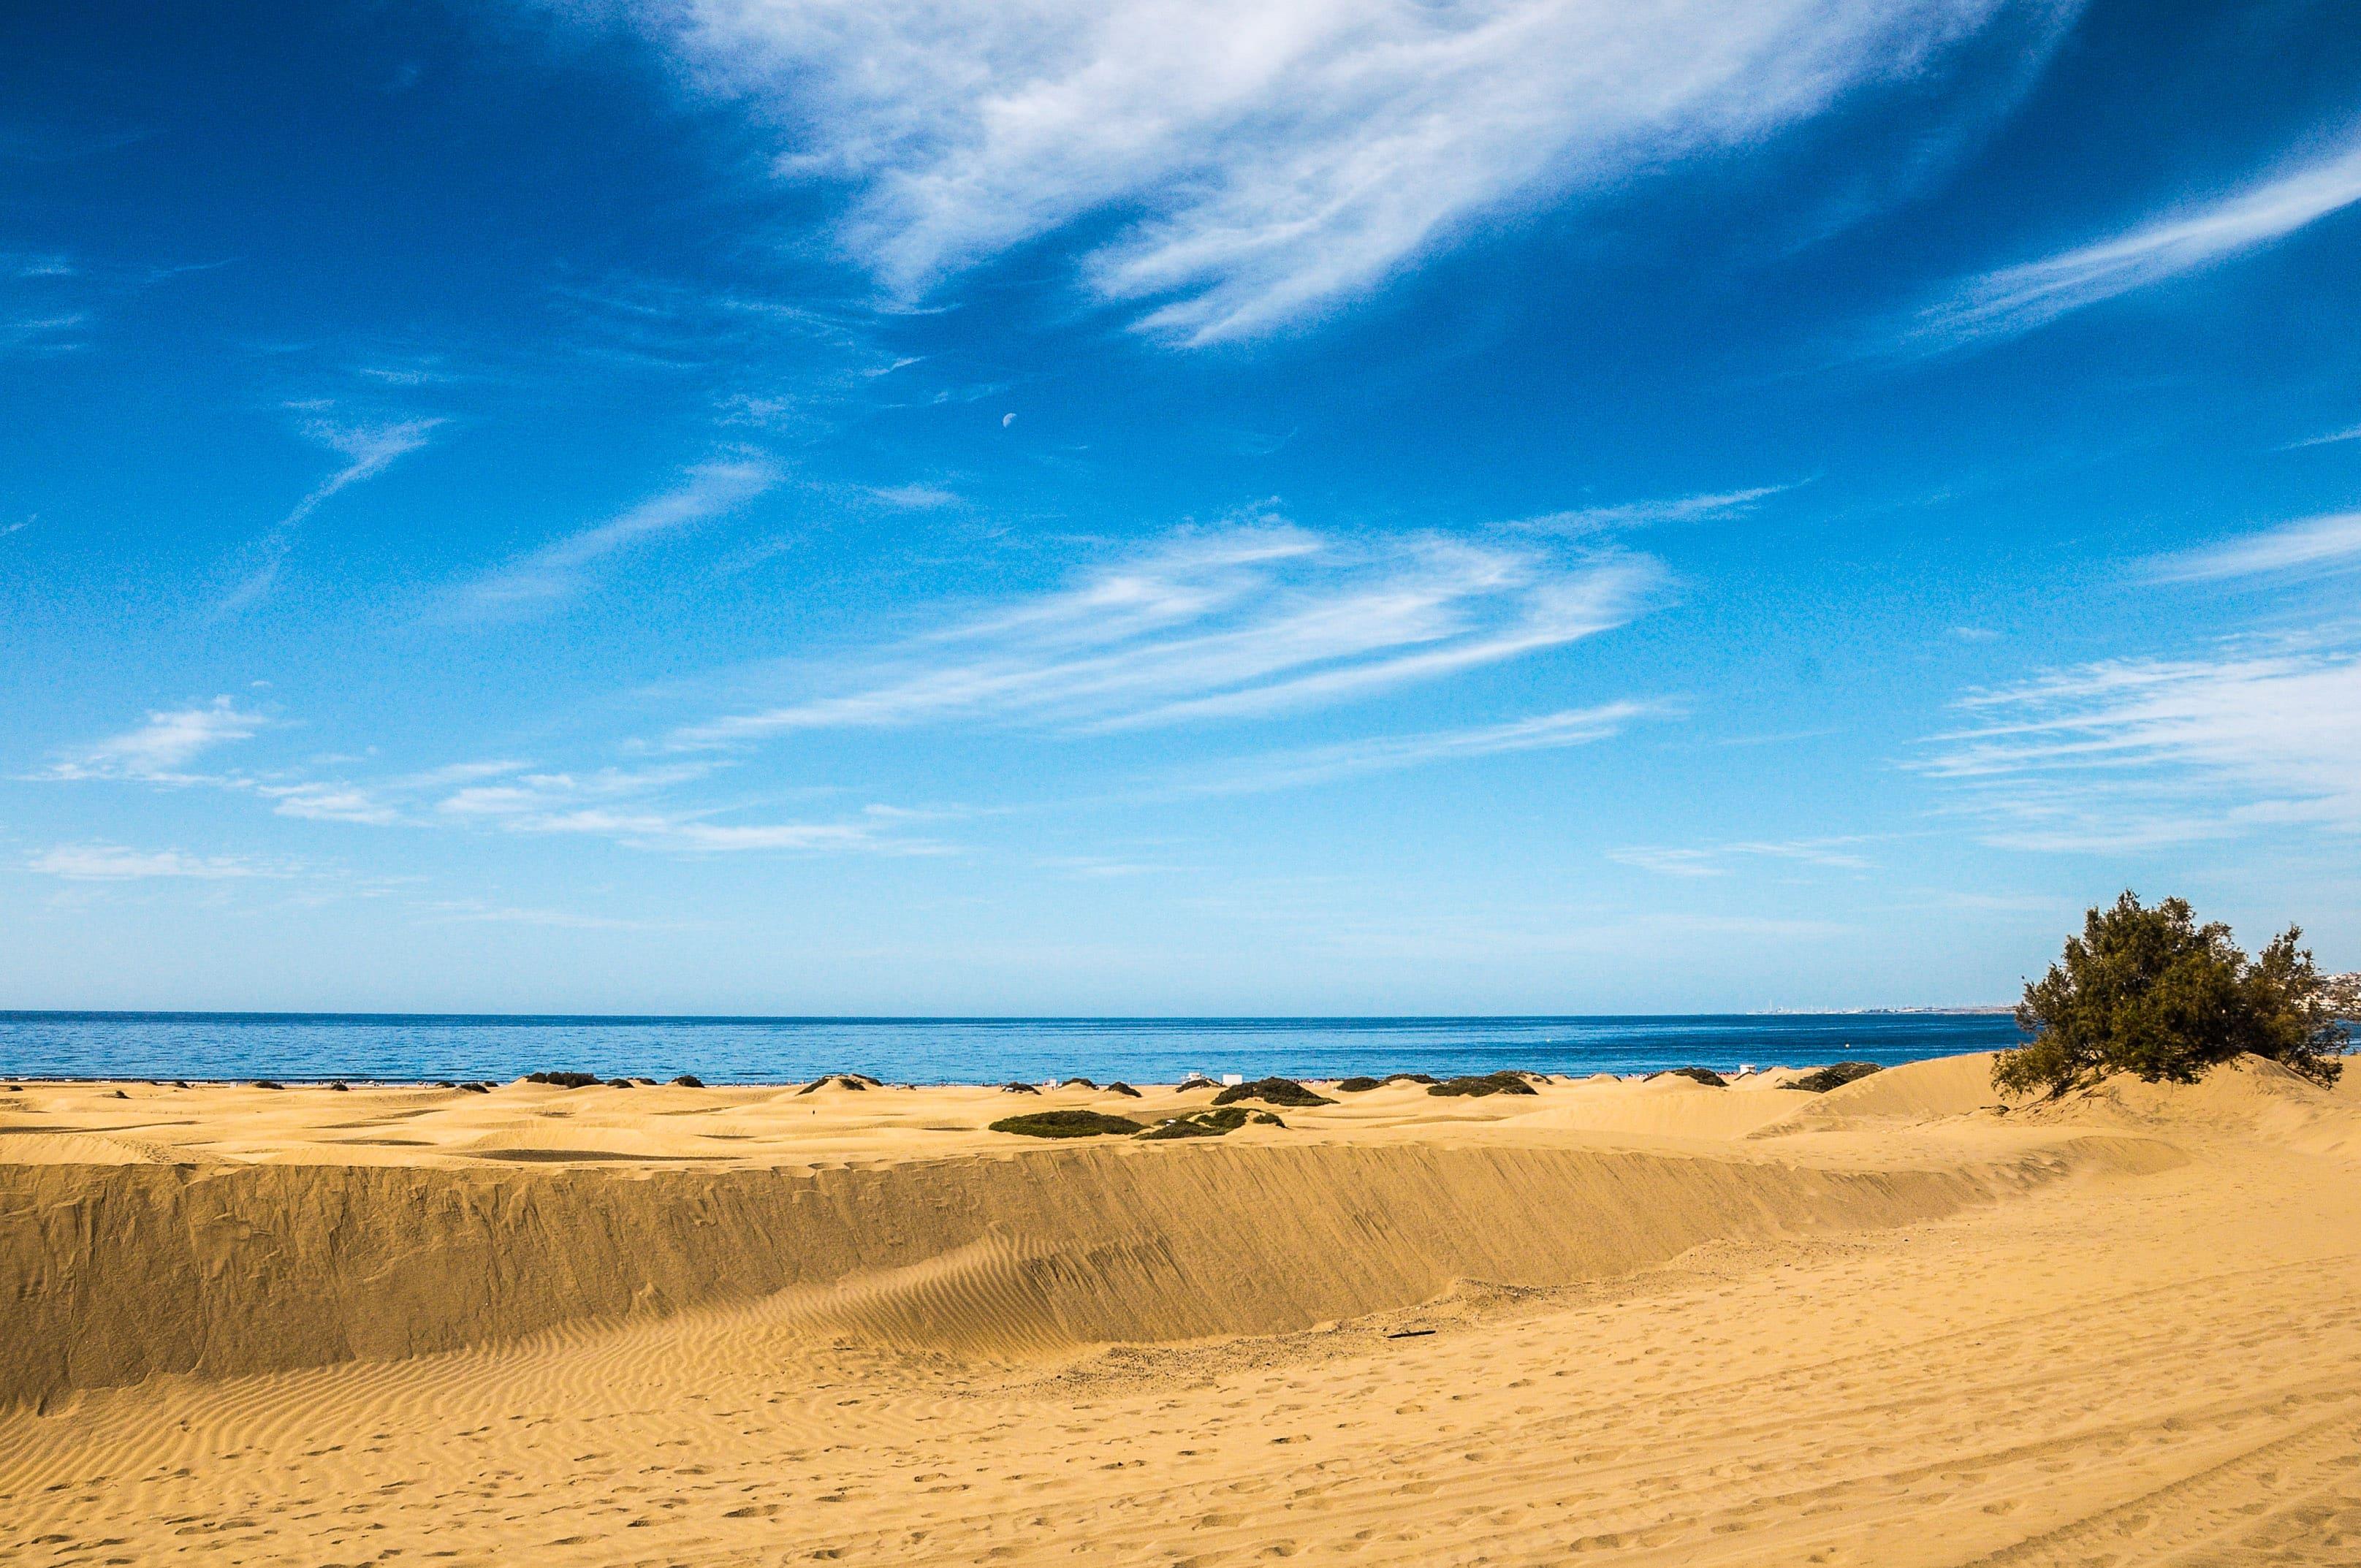 Strand op Gran Canaria, Canarische Eilanden, Spanje